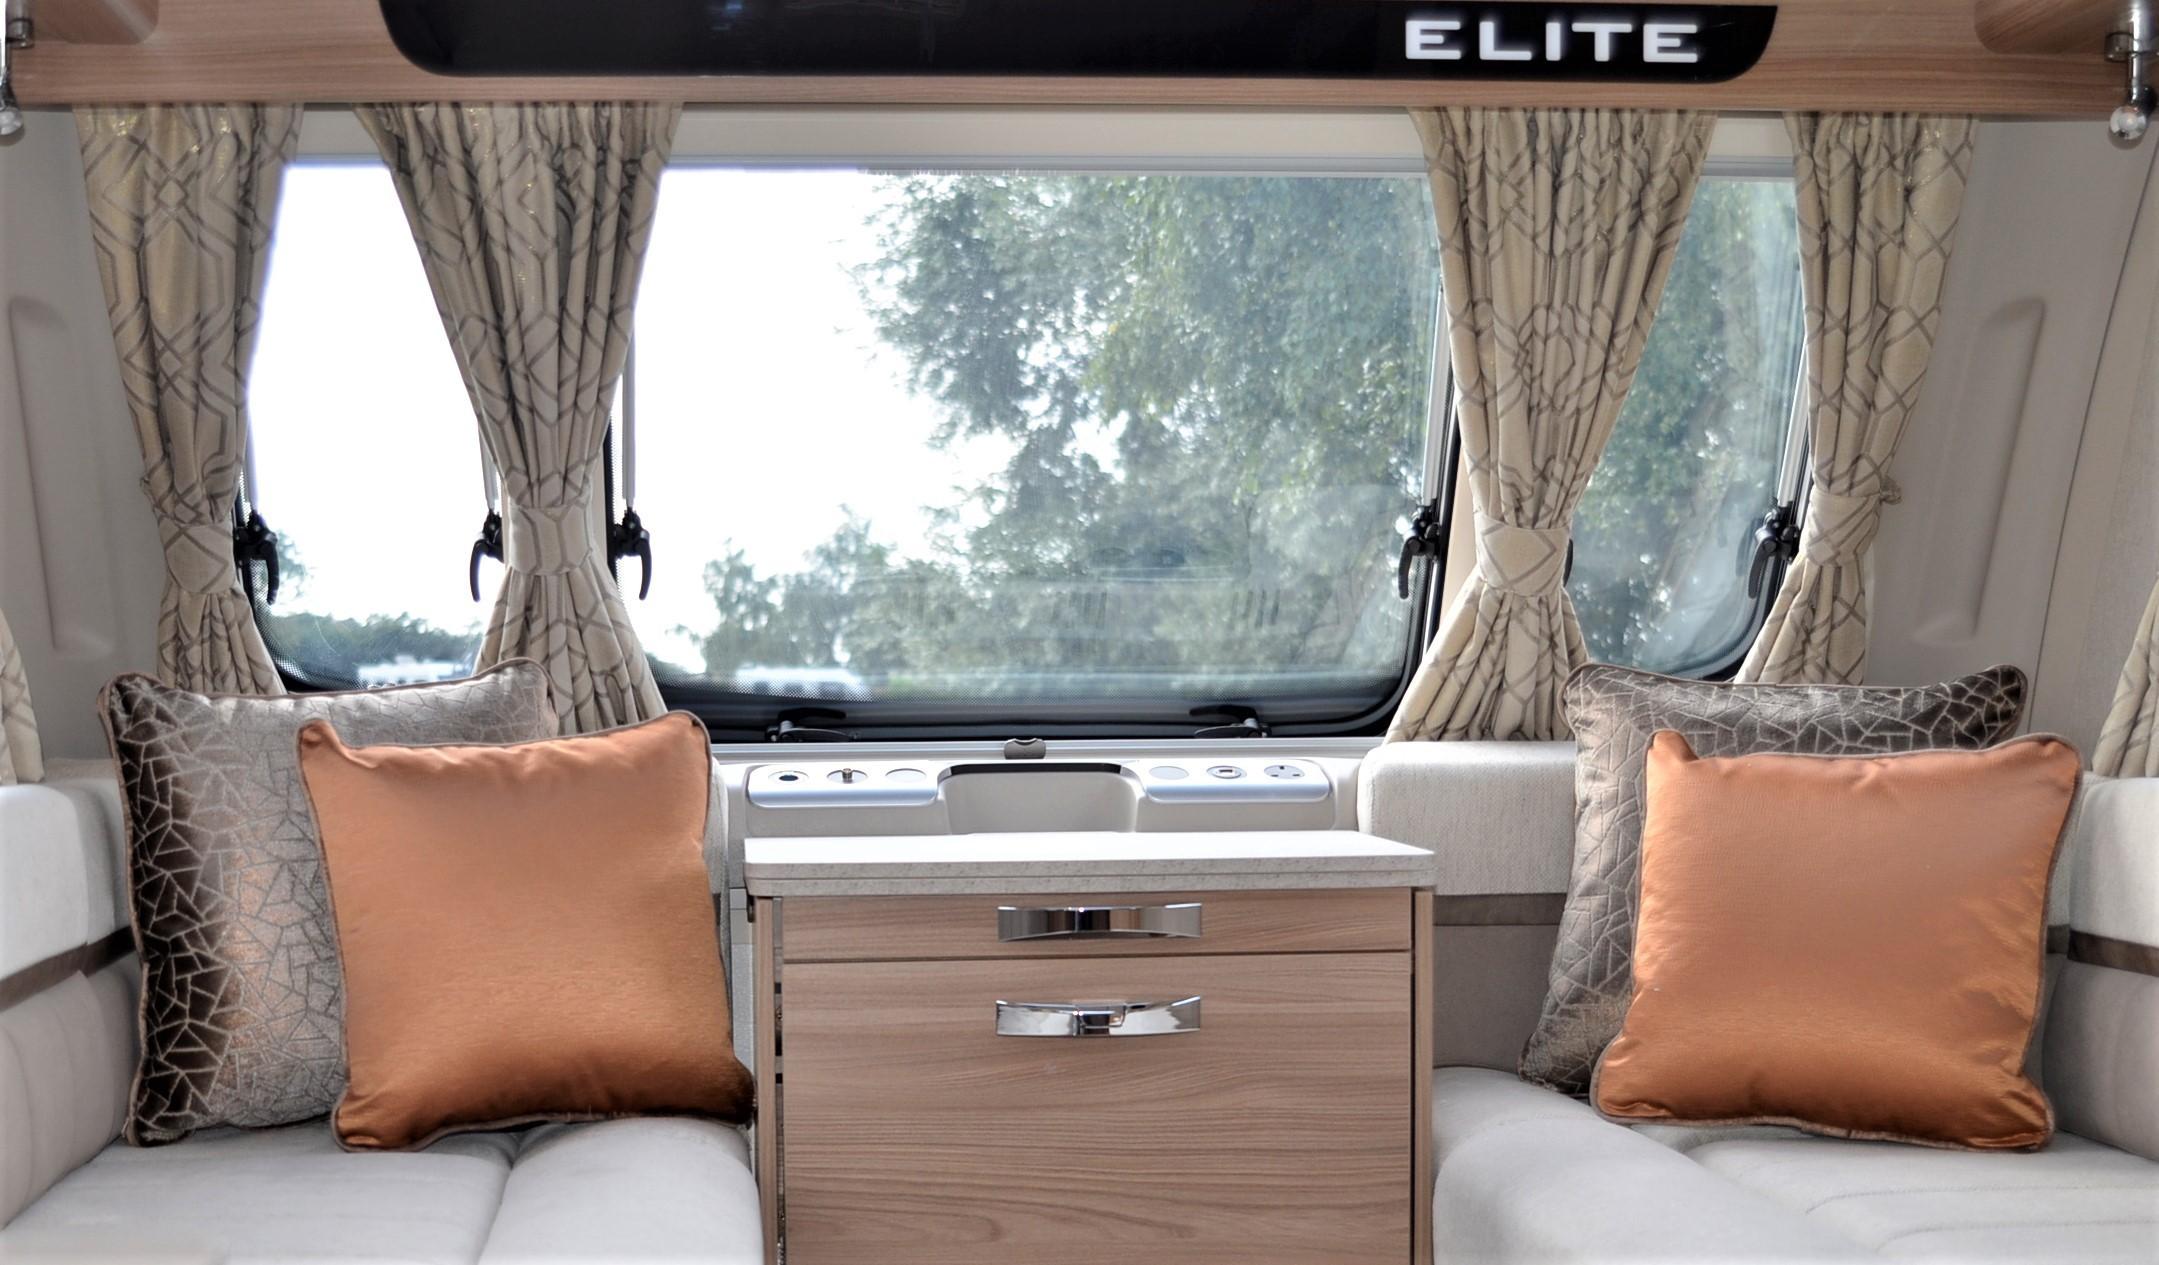 Swift Caravans Elite Internal Image